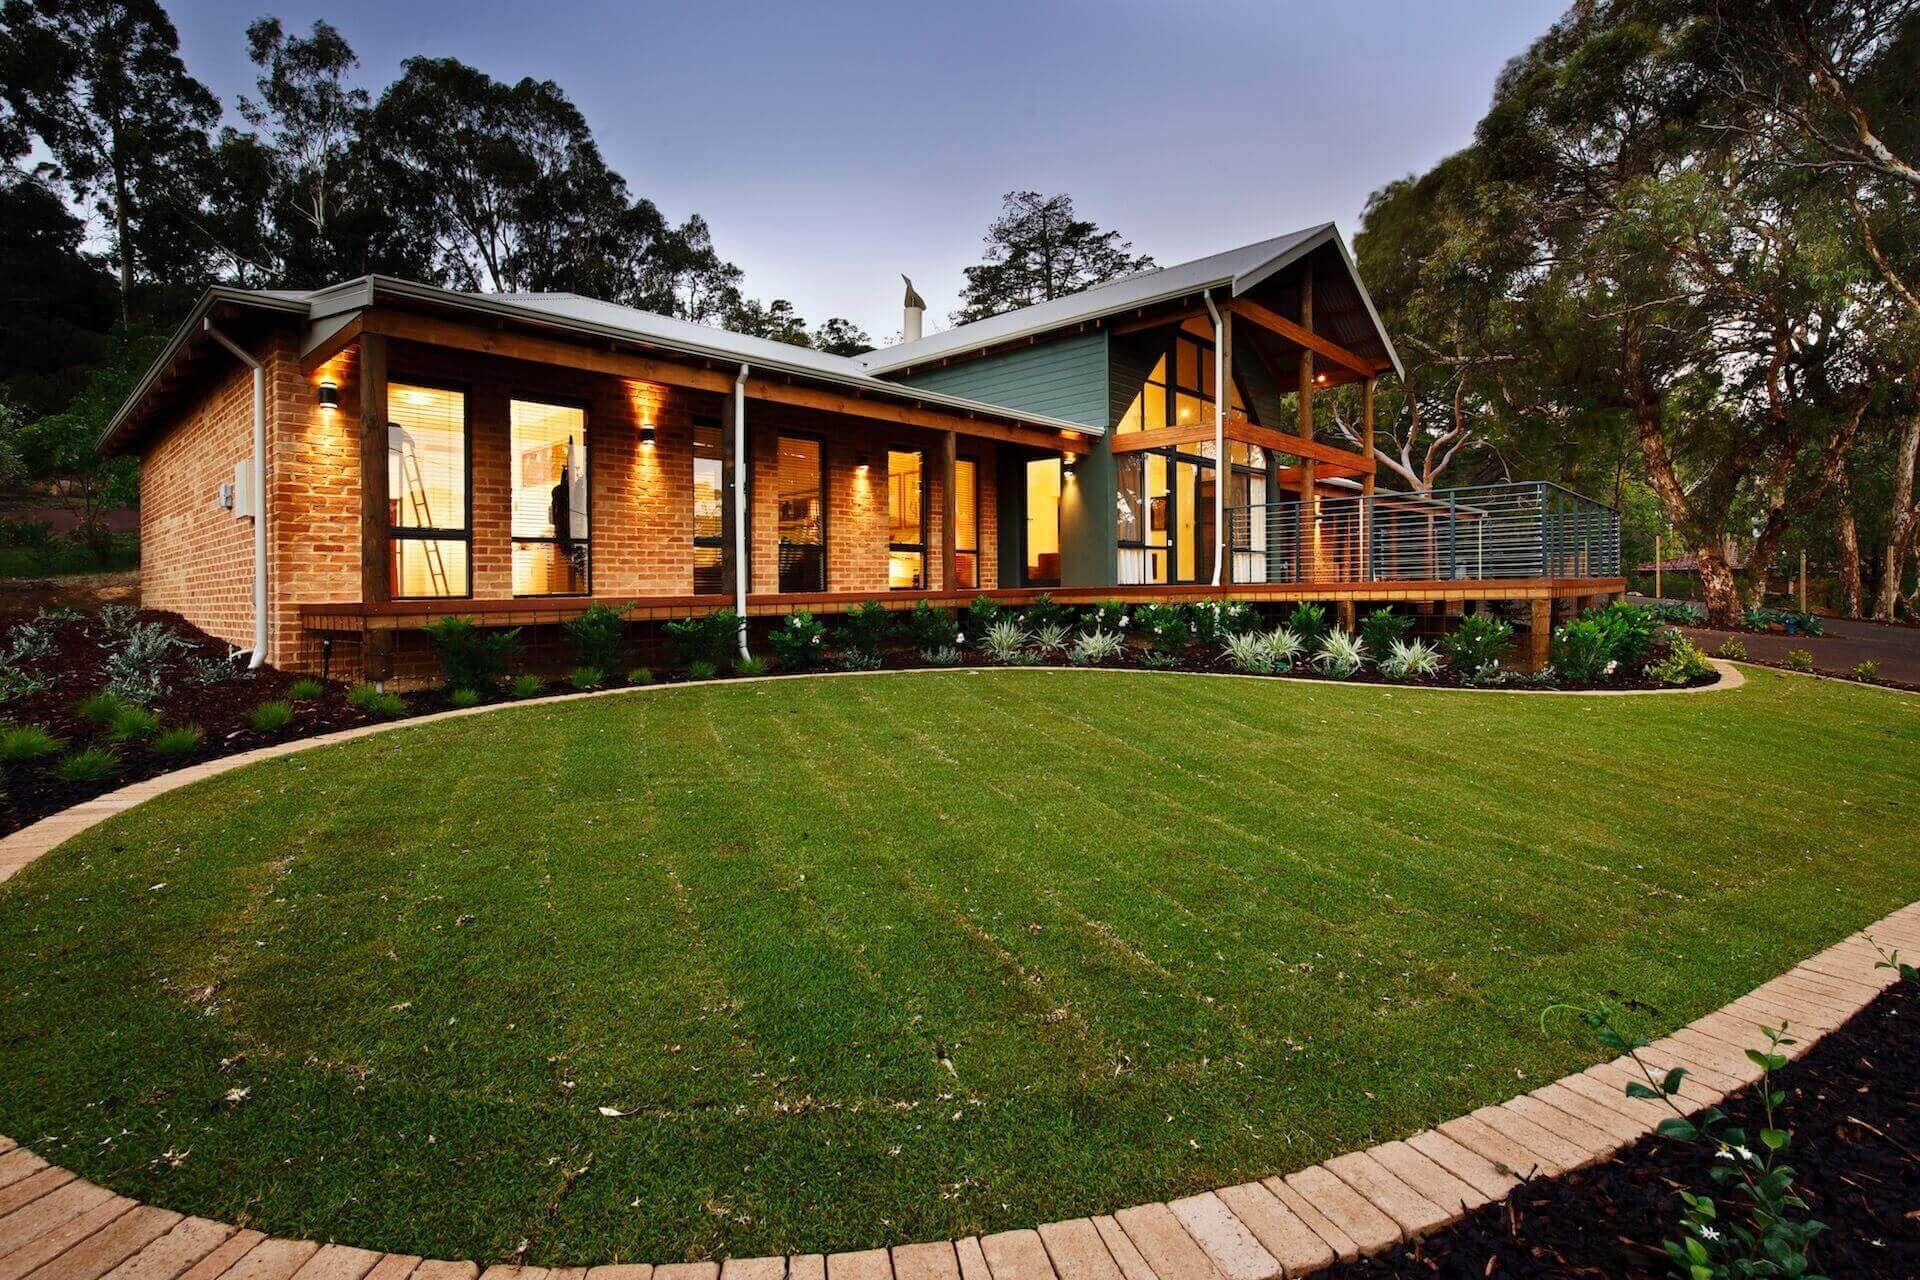 Homestead Style Homes Australian Homestead Designs Amp Plans The Argyle Country House Design Australian Country Houses Australian House Plans